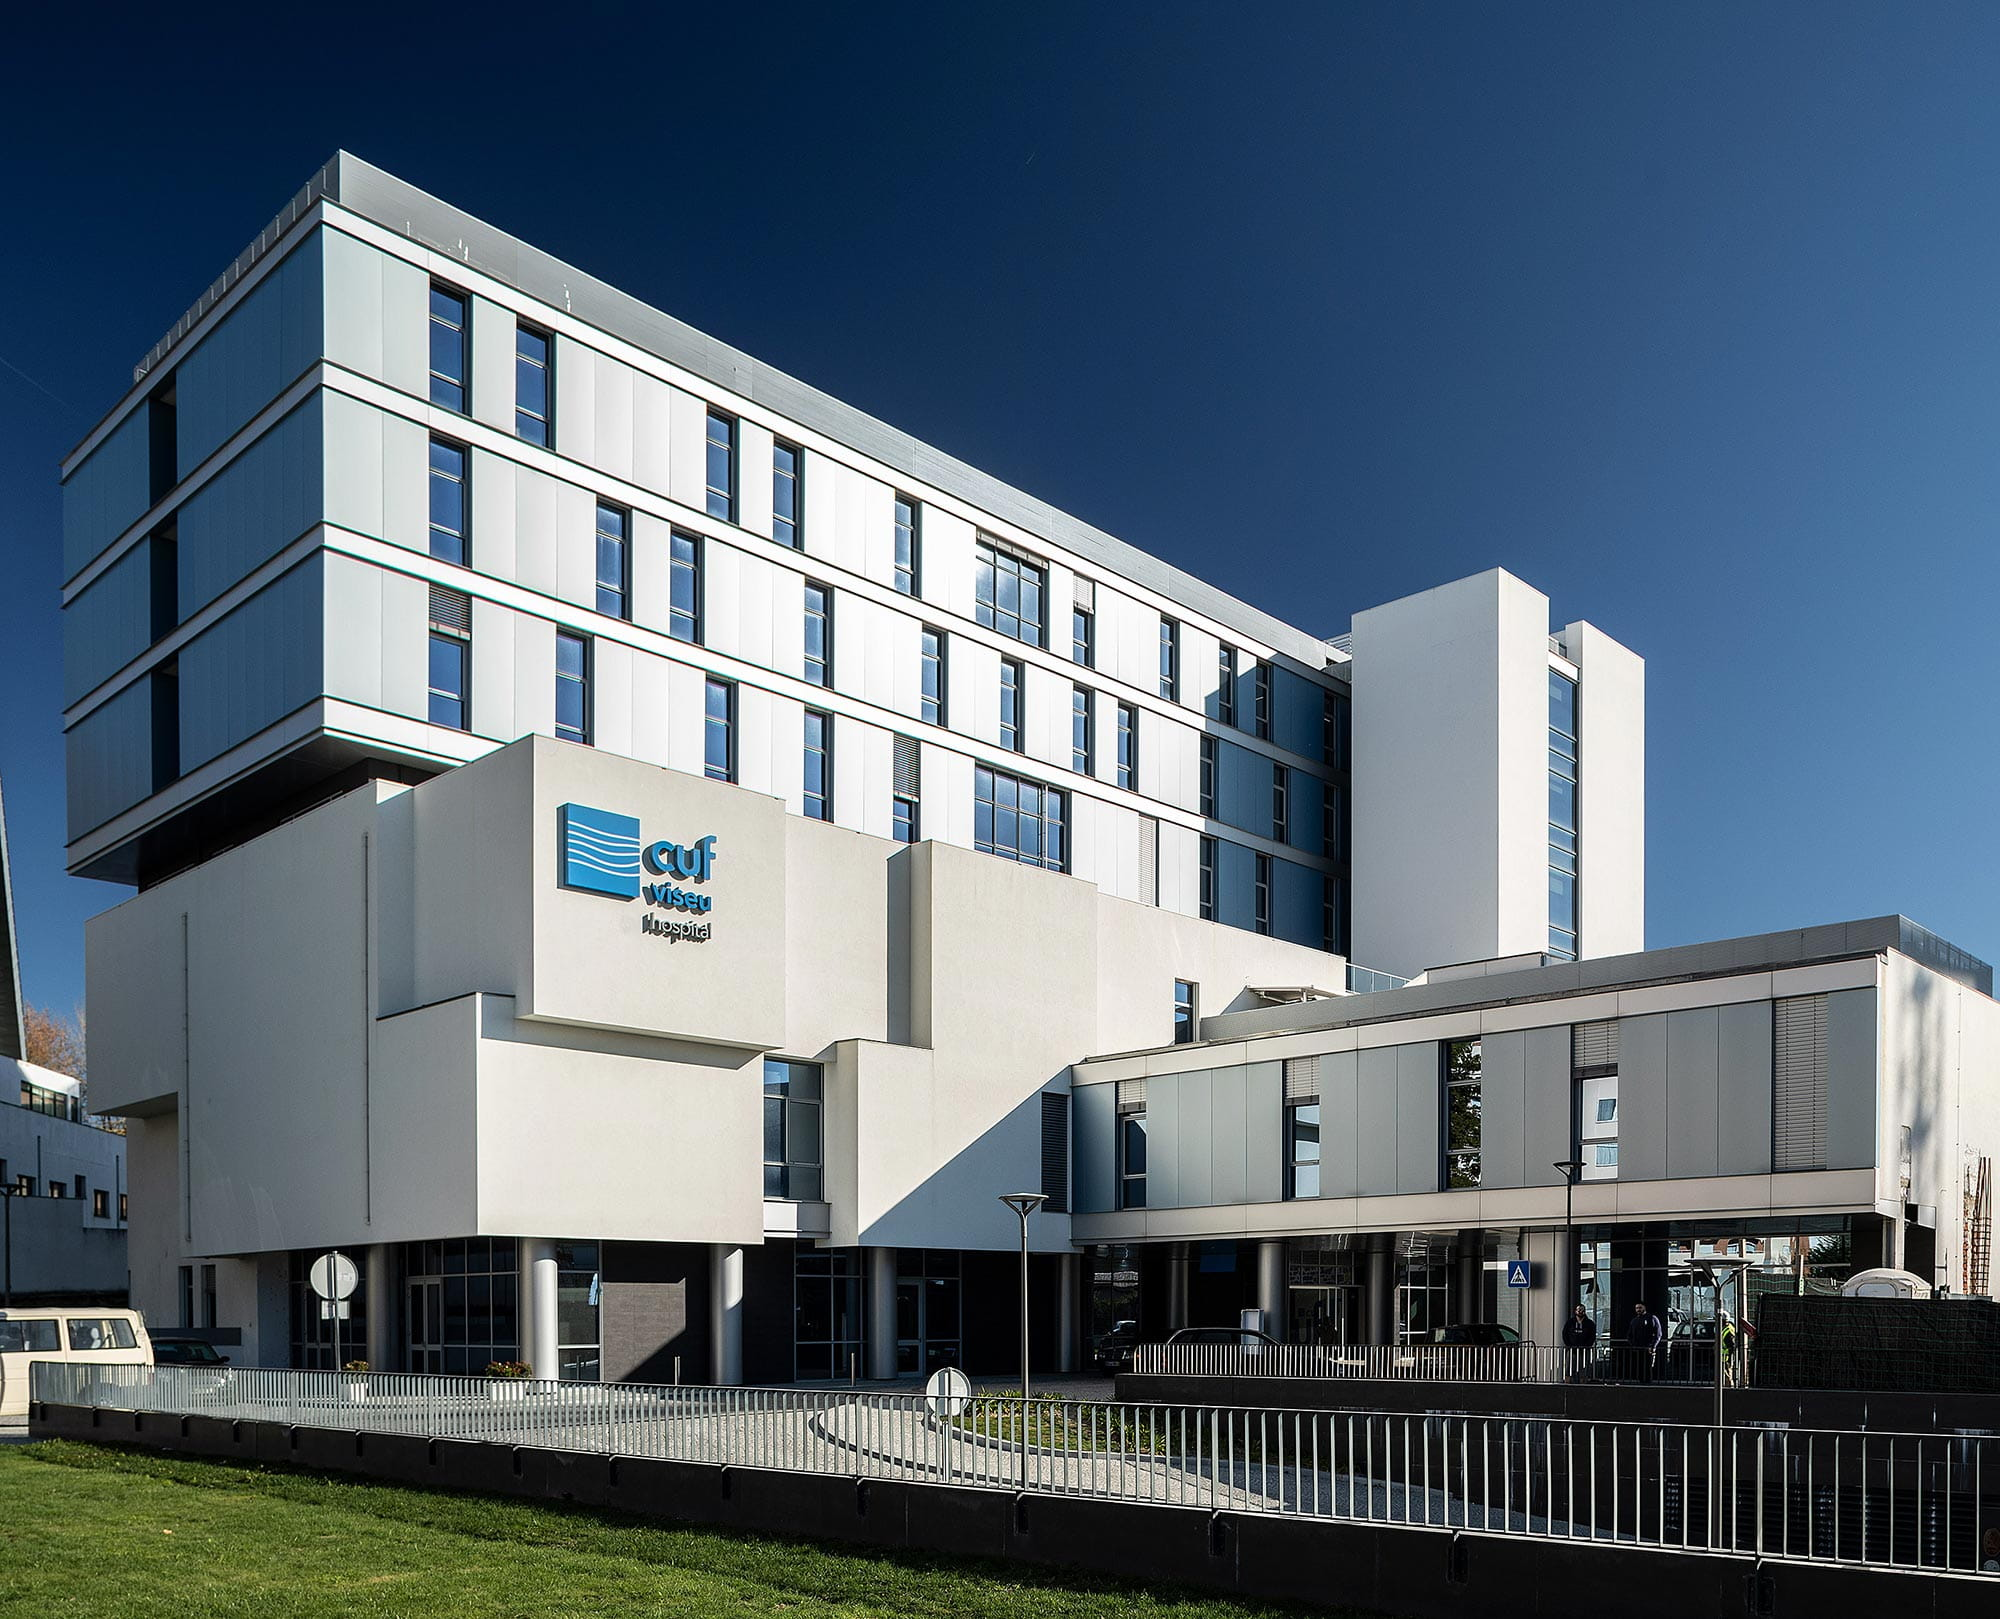 Hospital - CUF Viseu